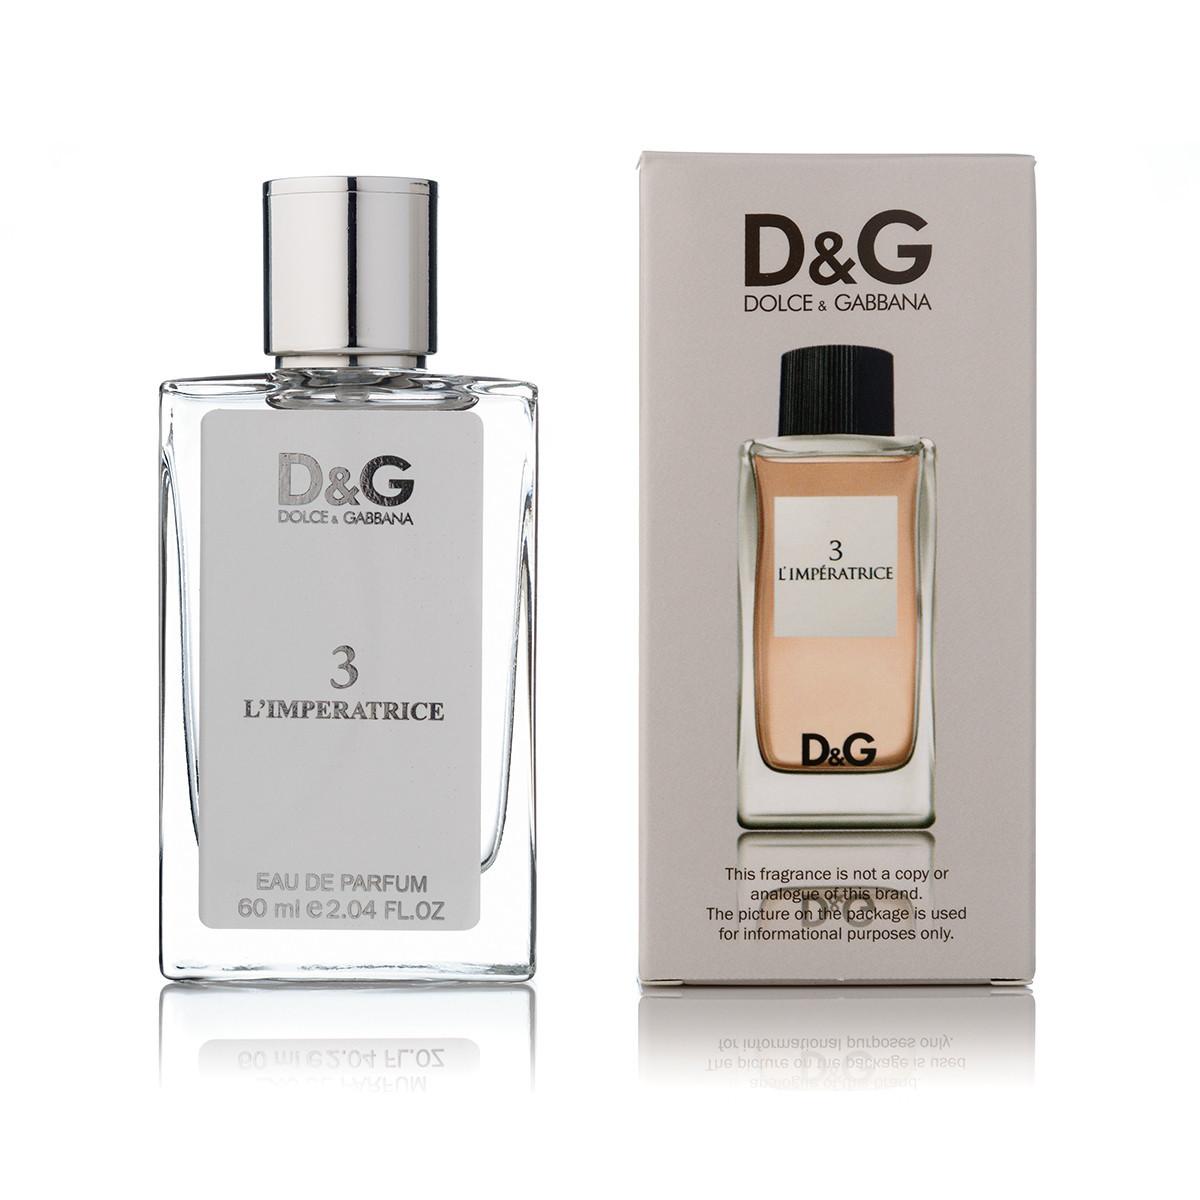 Женский тестер Dolce & Gabbana L'Imperatrice №3 (Императрица 3 от Дольче Габбана) 60 ml (реплика)